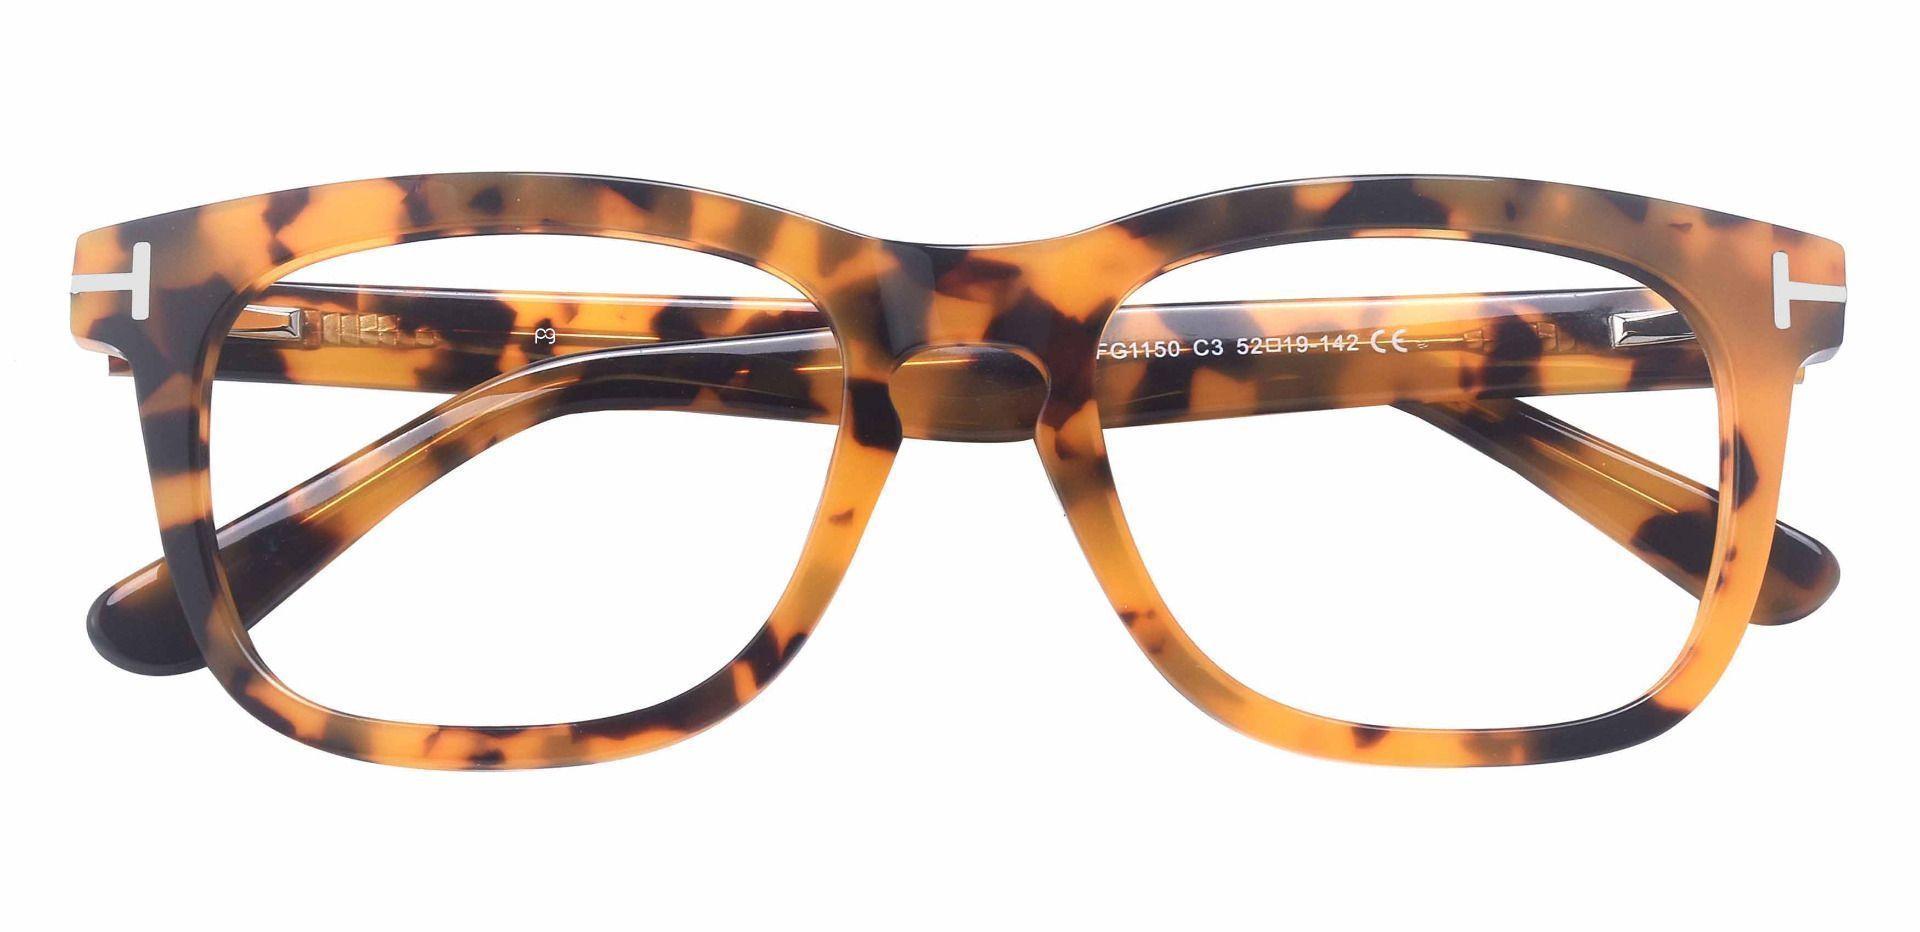 Heritage Square Prescription Glasses - Tortoise